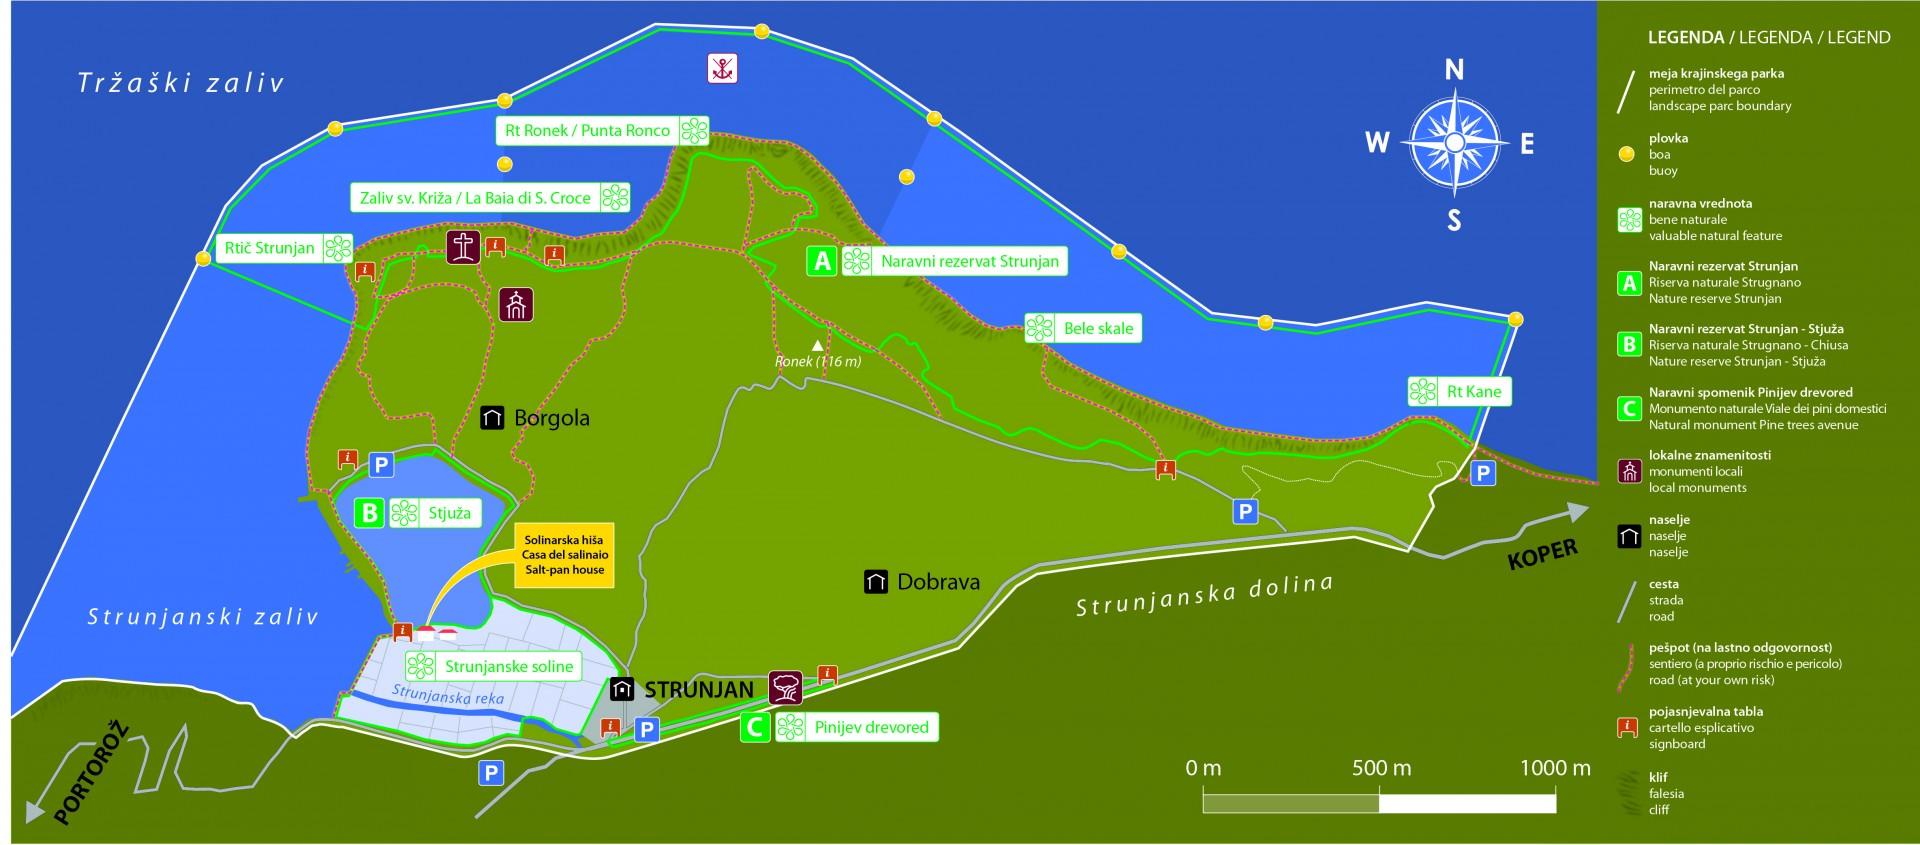 Naravni rezervat Strunjan